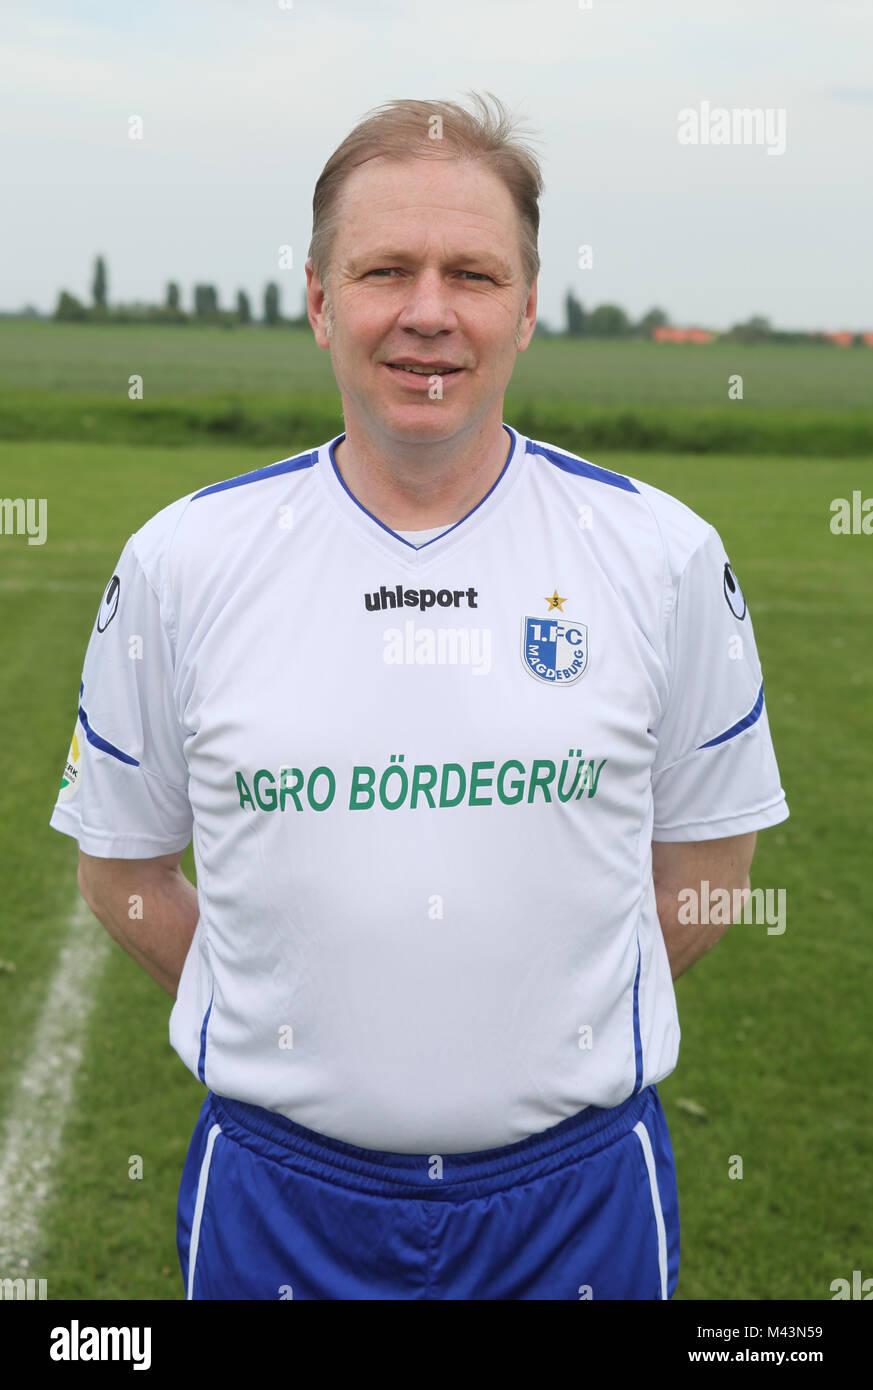 Detlef Schoeßler (1.FC Magdeburg,Dynamo Dresden and VfB Leipzig) - Stock Image